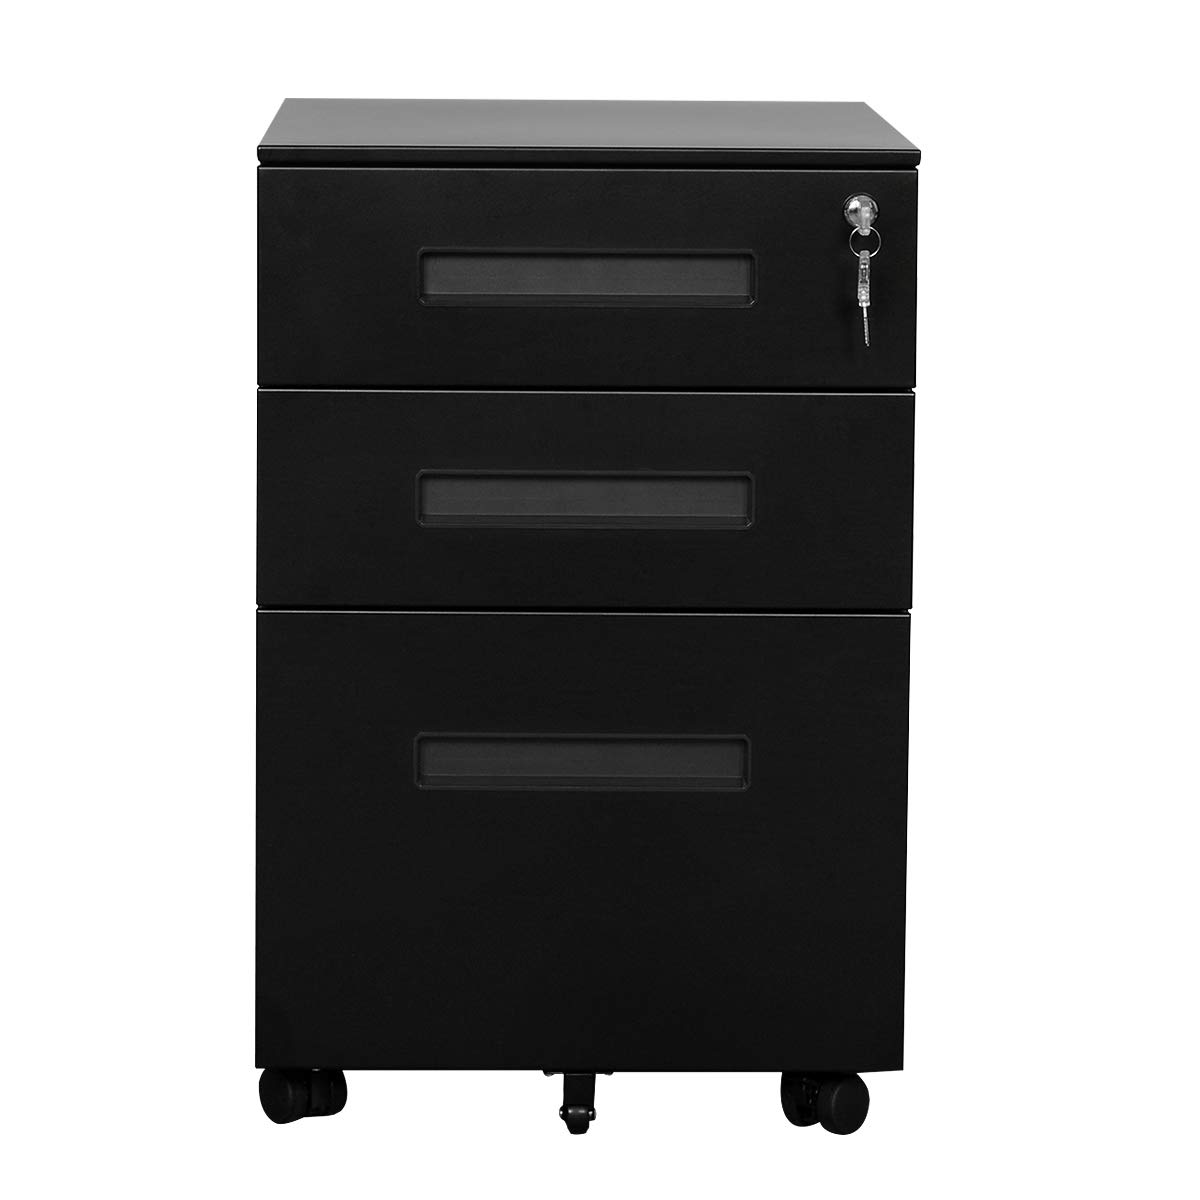 DEVAISE 3-Drawer Metal Mobile File Cabinet with Lock Keys (Black & Black)